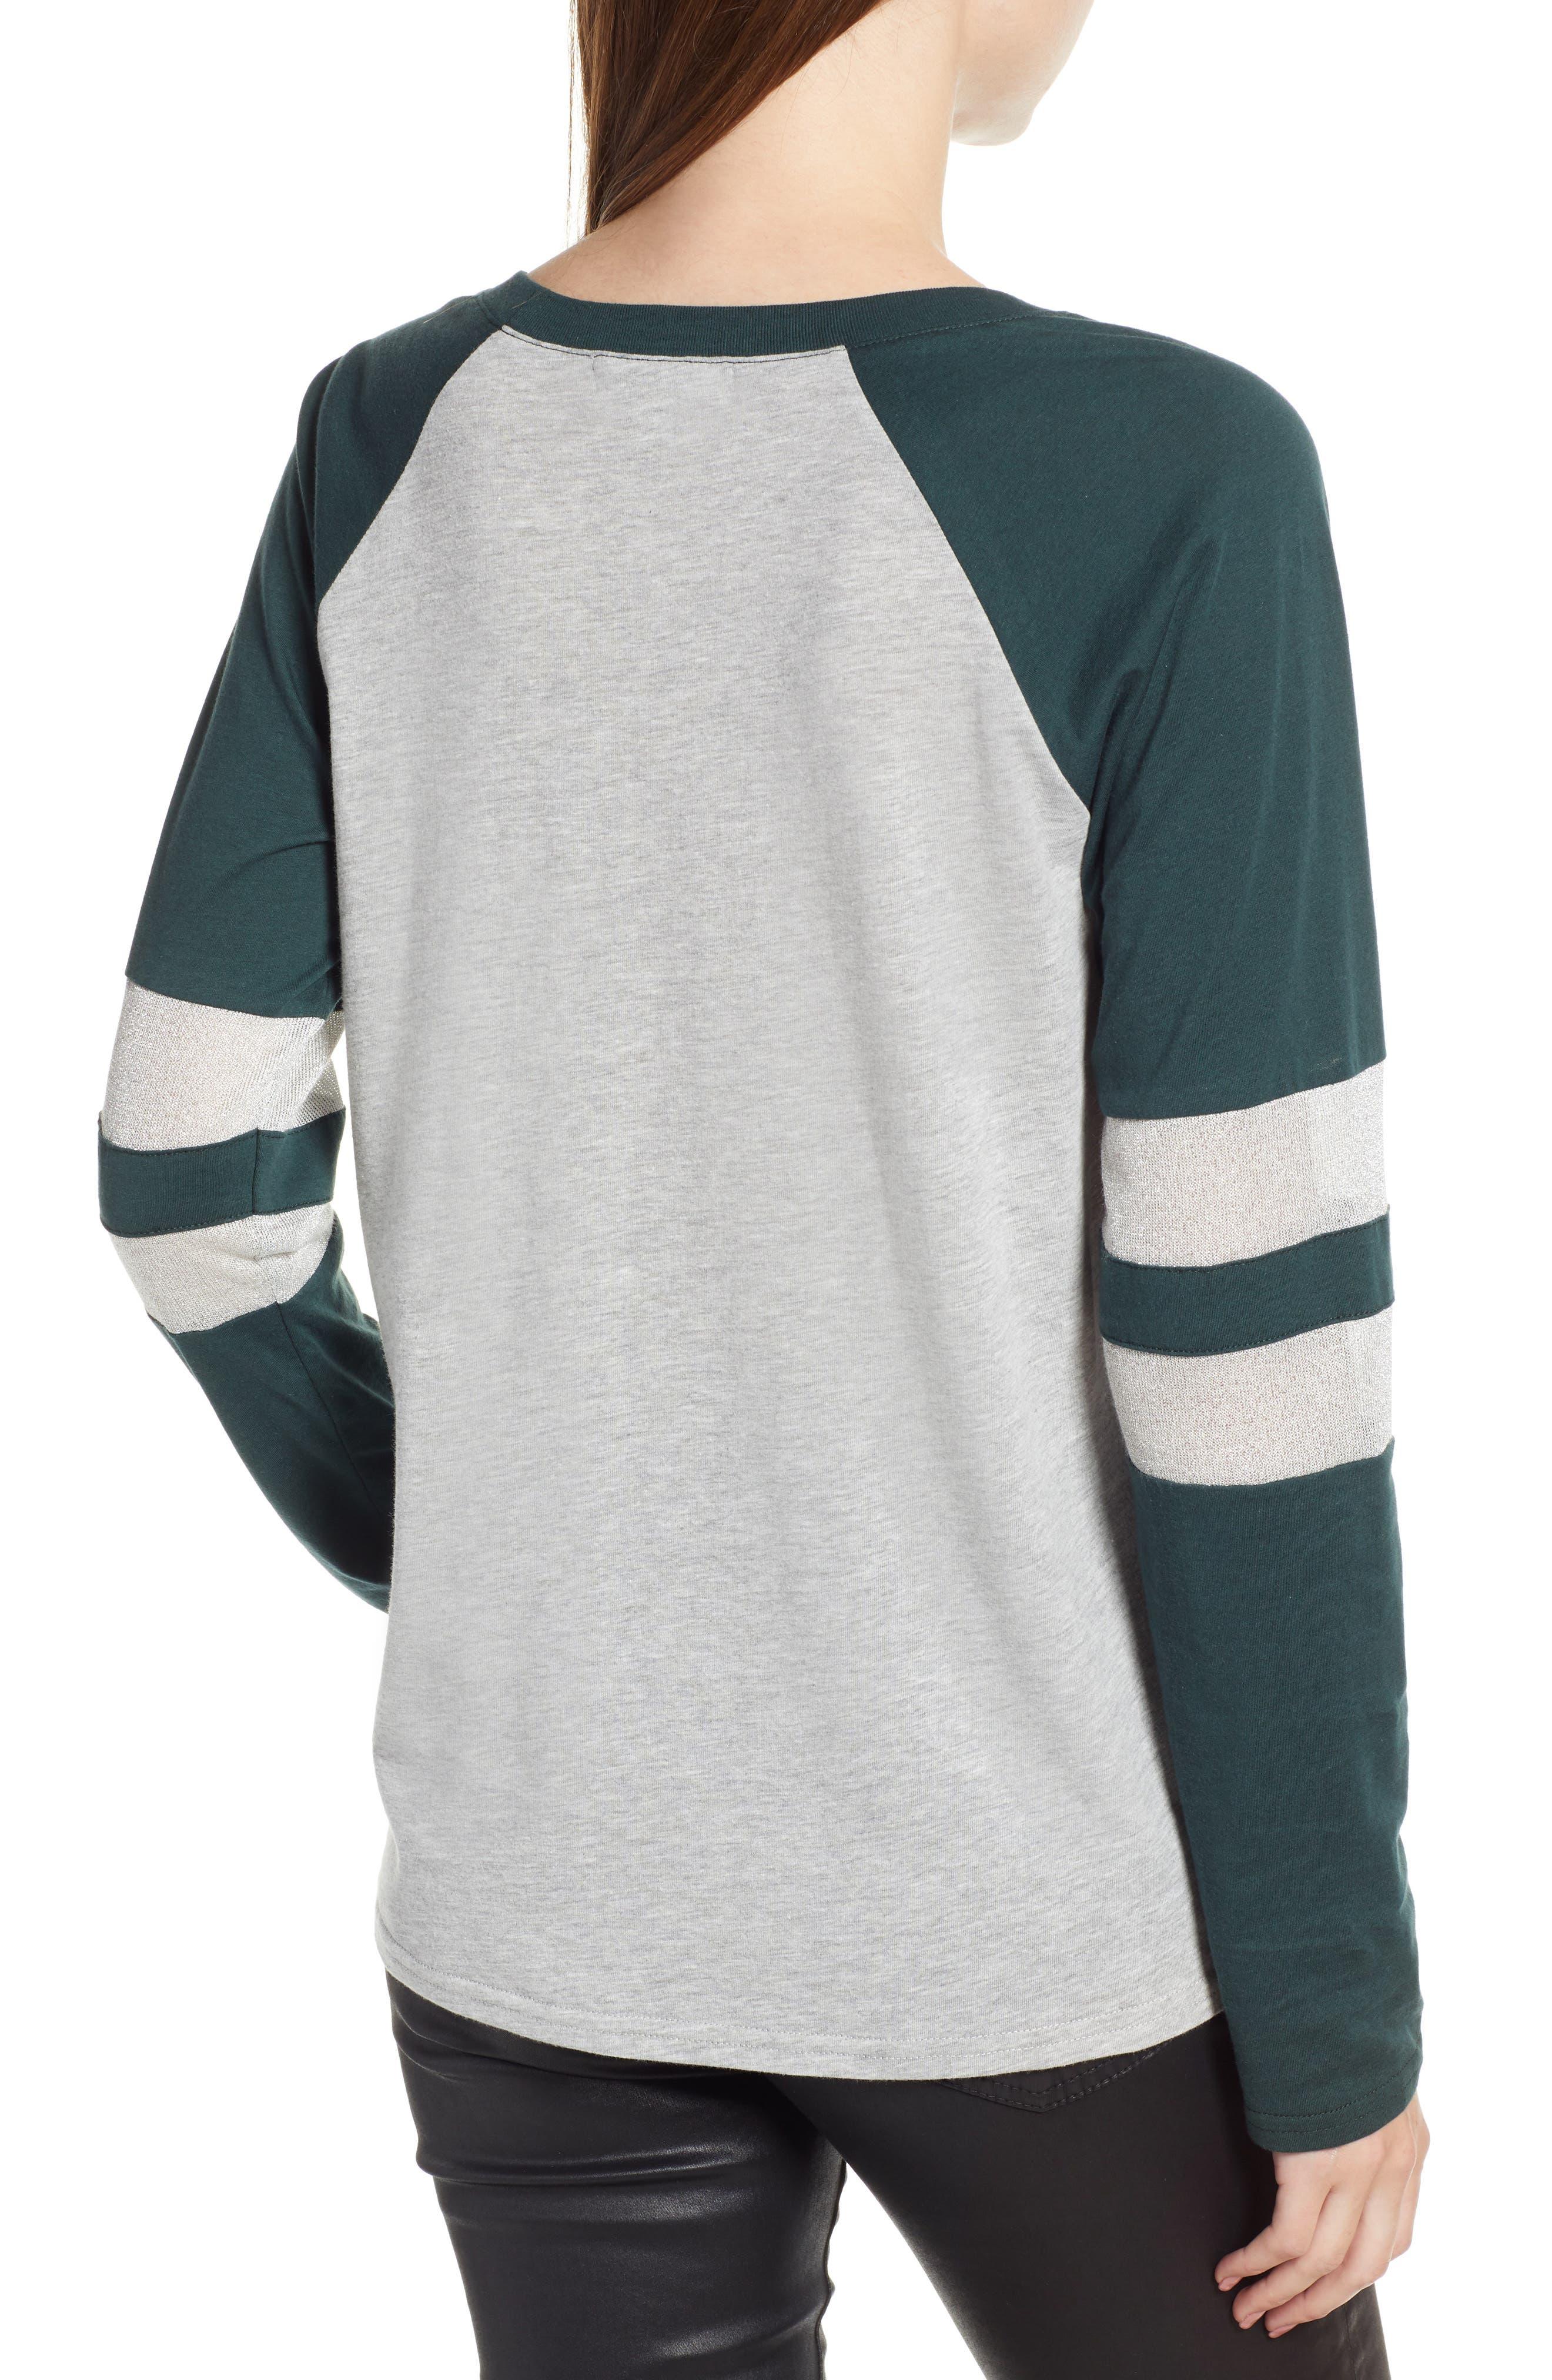 Colorblock Cotton Blend Raglan Top,                             Alternate thumbnail 2, color,                             GREY- GREEN GABLES COMBO